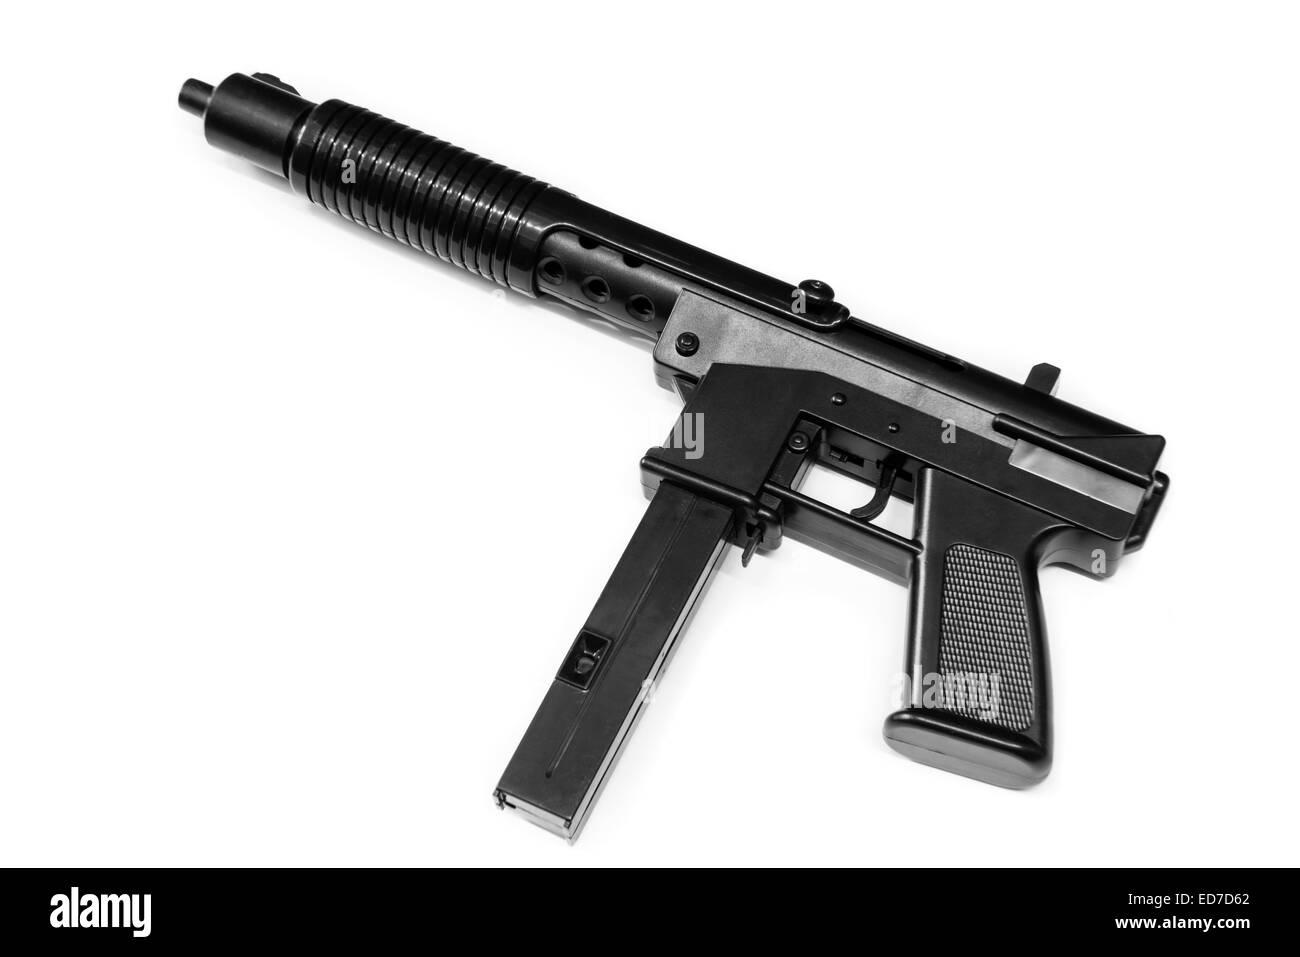 Airsoft Gun Stock Photos Images Alamy Sig 556 Assault Rifle Model Kit Toys Toy Image